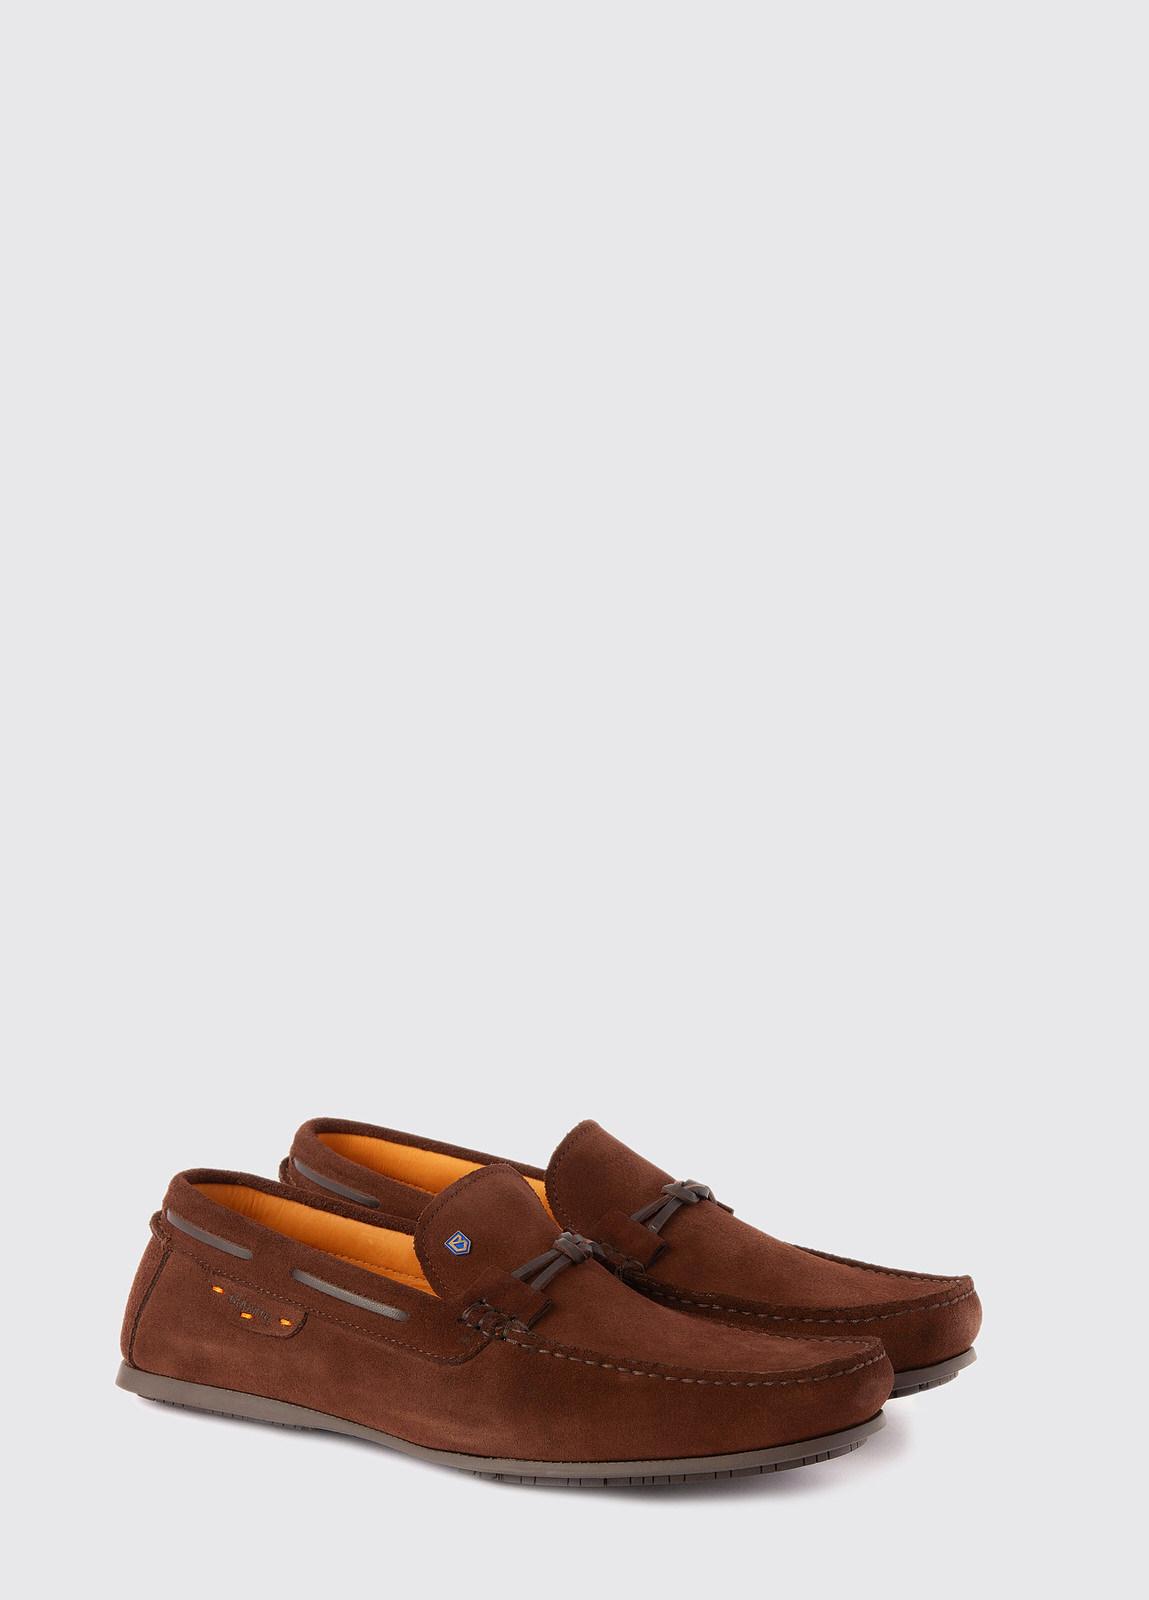 Voyager Deck shoes - Cigar